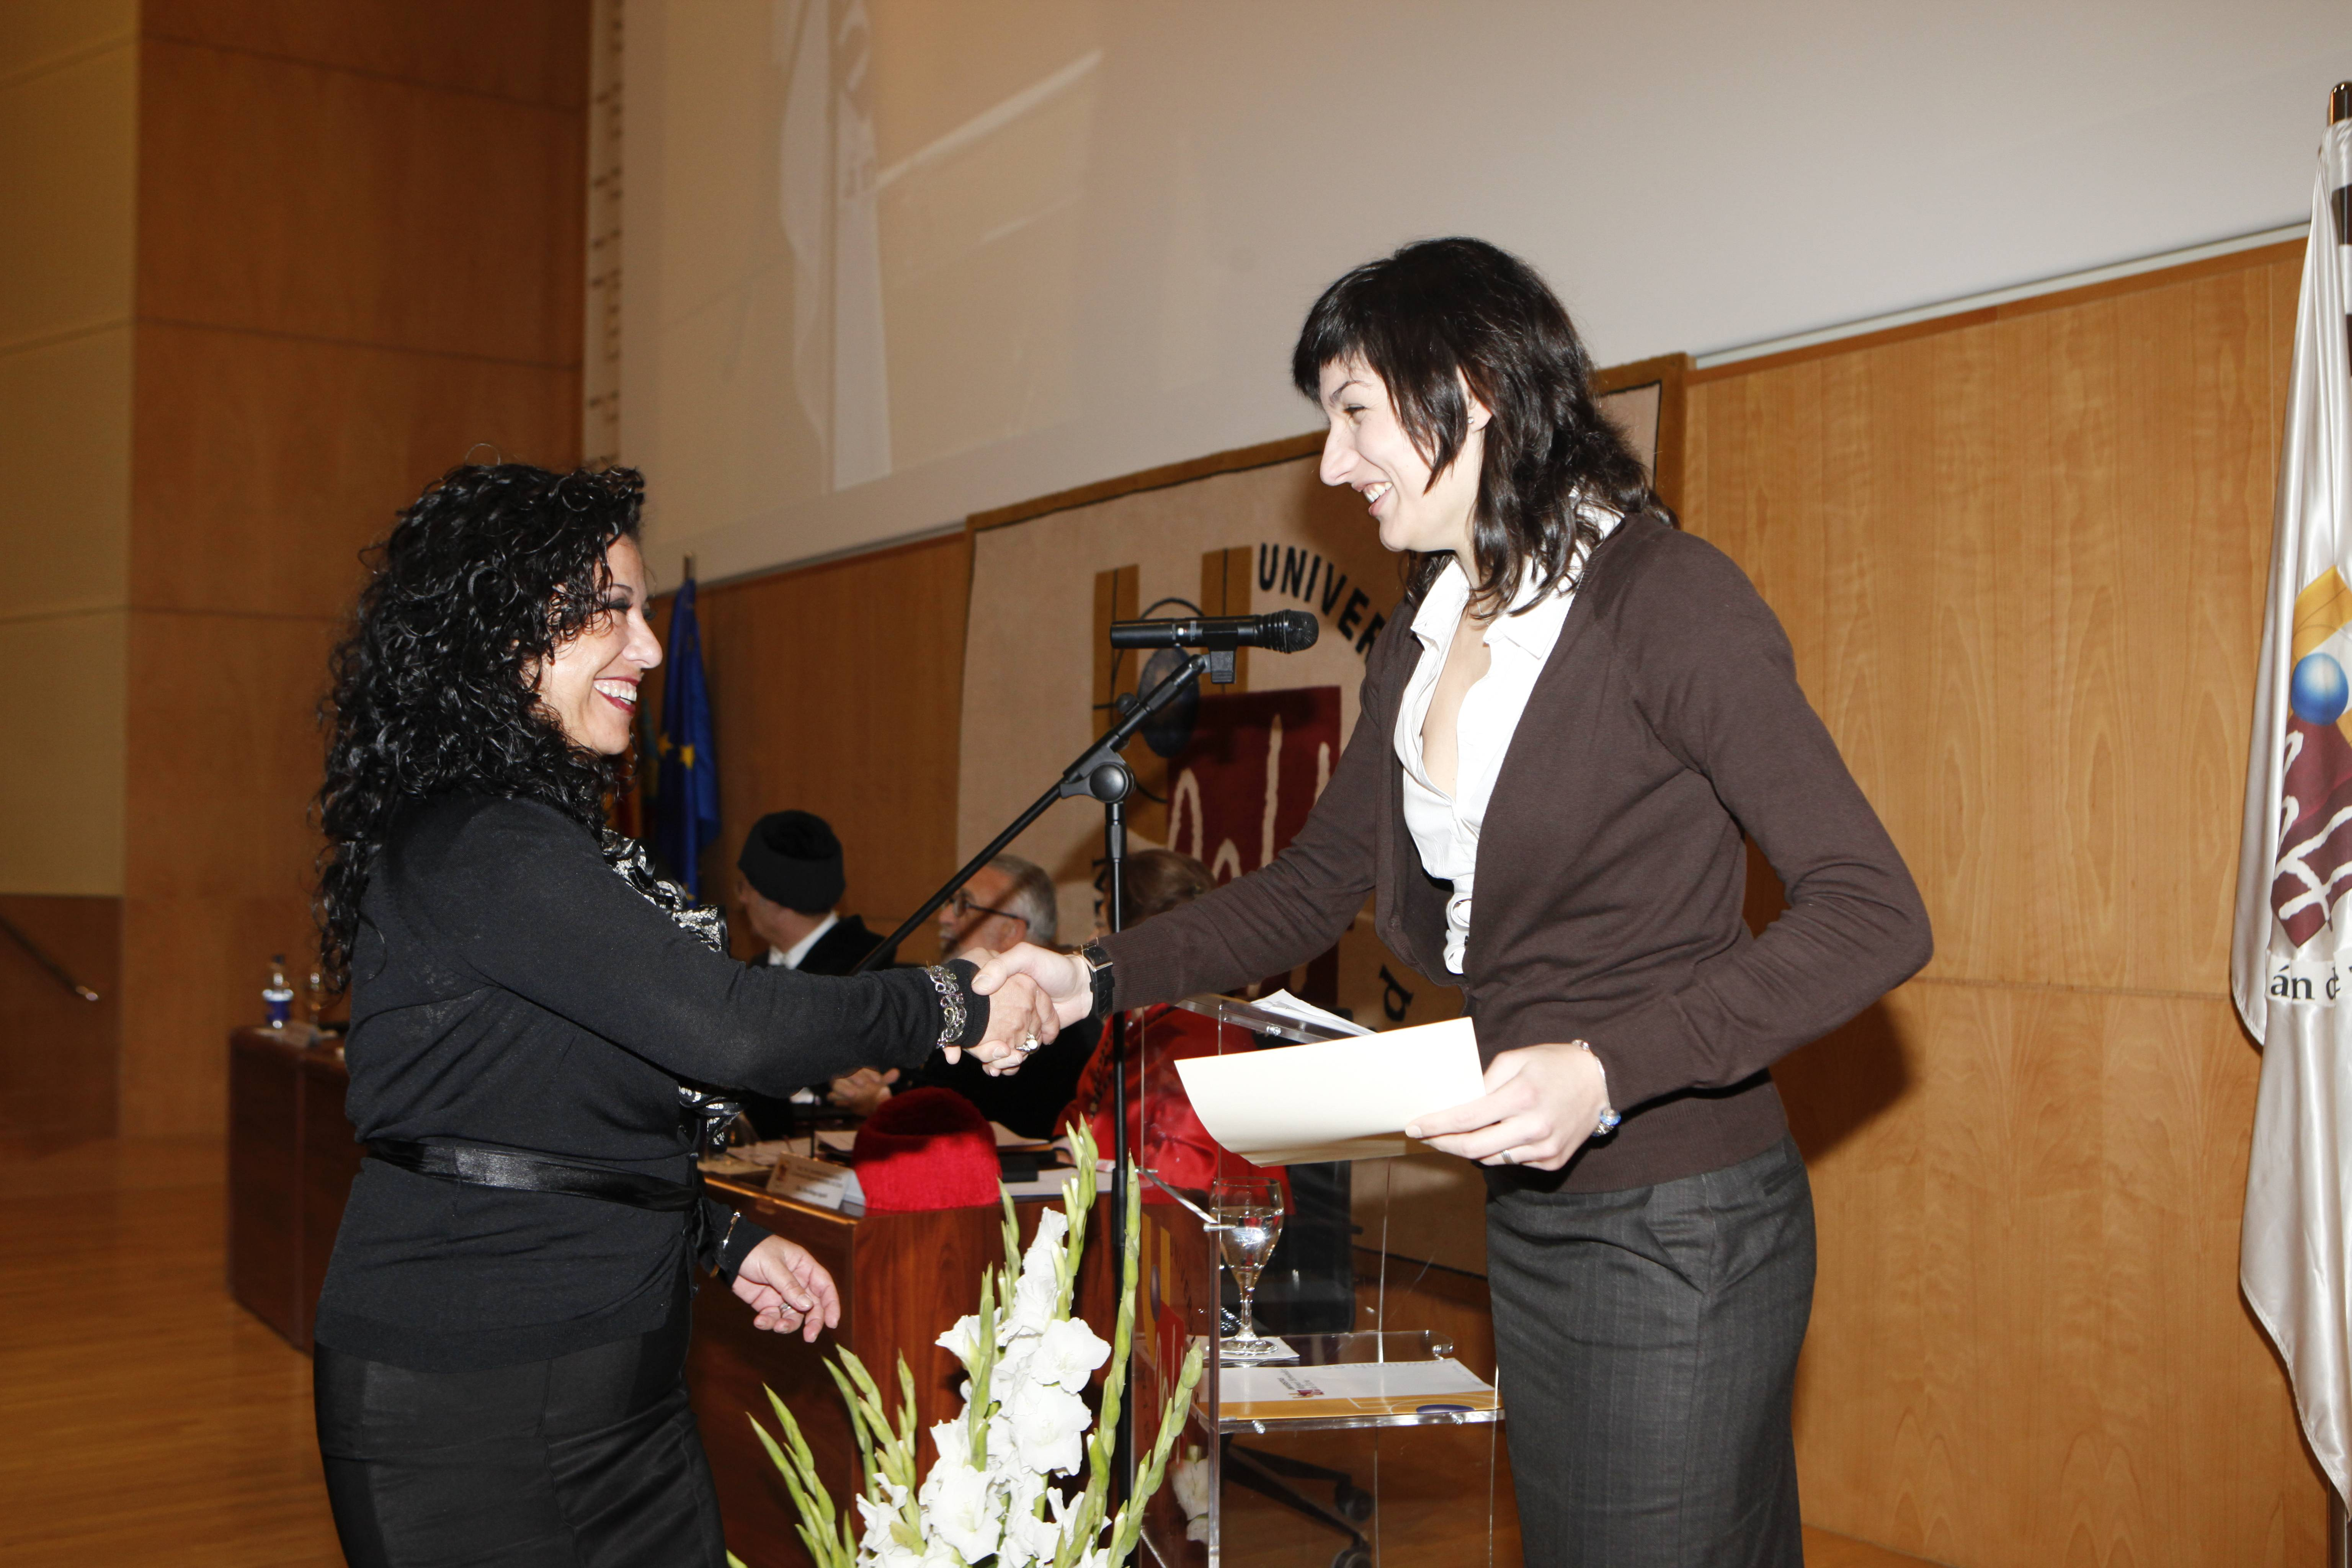 doctor-honoris-causa-luis-gamir_mg_1008.jpg